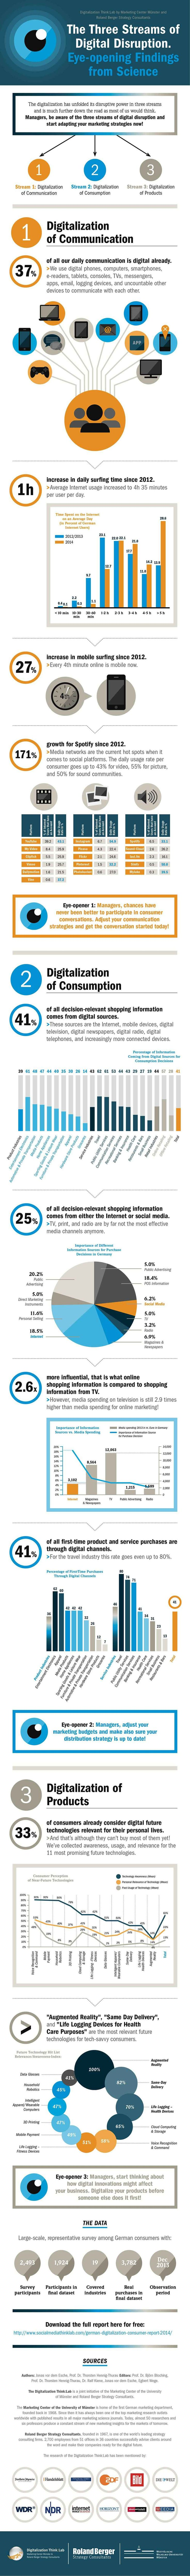 3 streams of #Digital #Disruption: #Digitalisation of #Communication, #Consumption & #Products